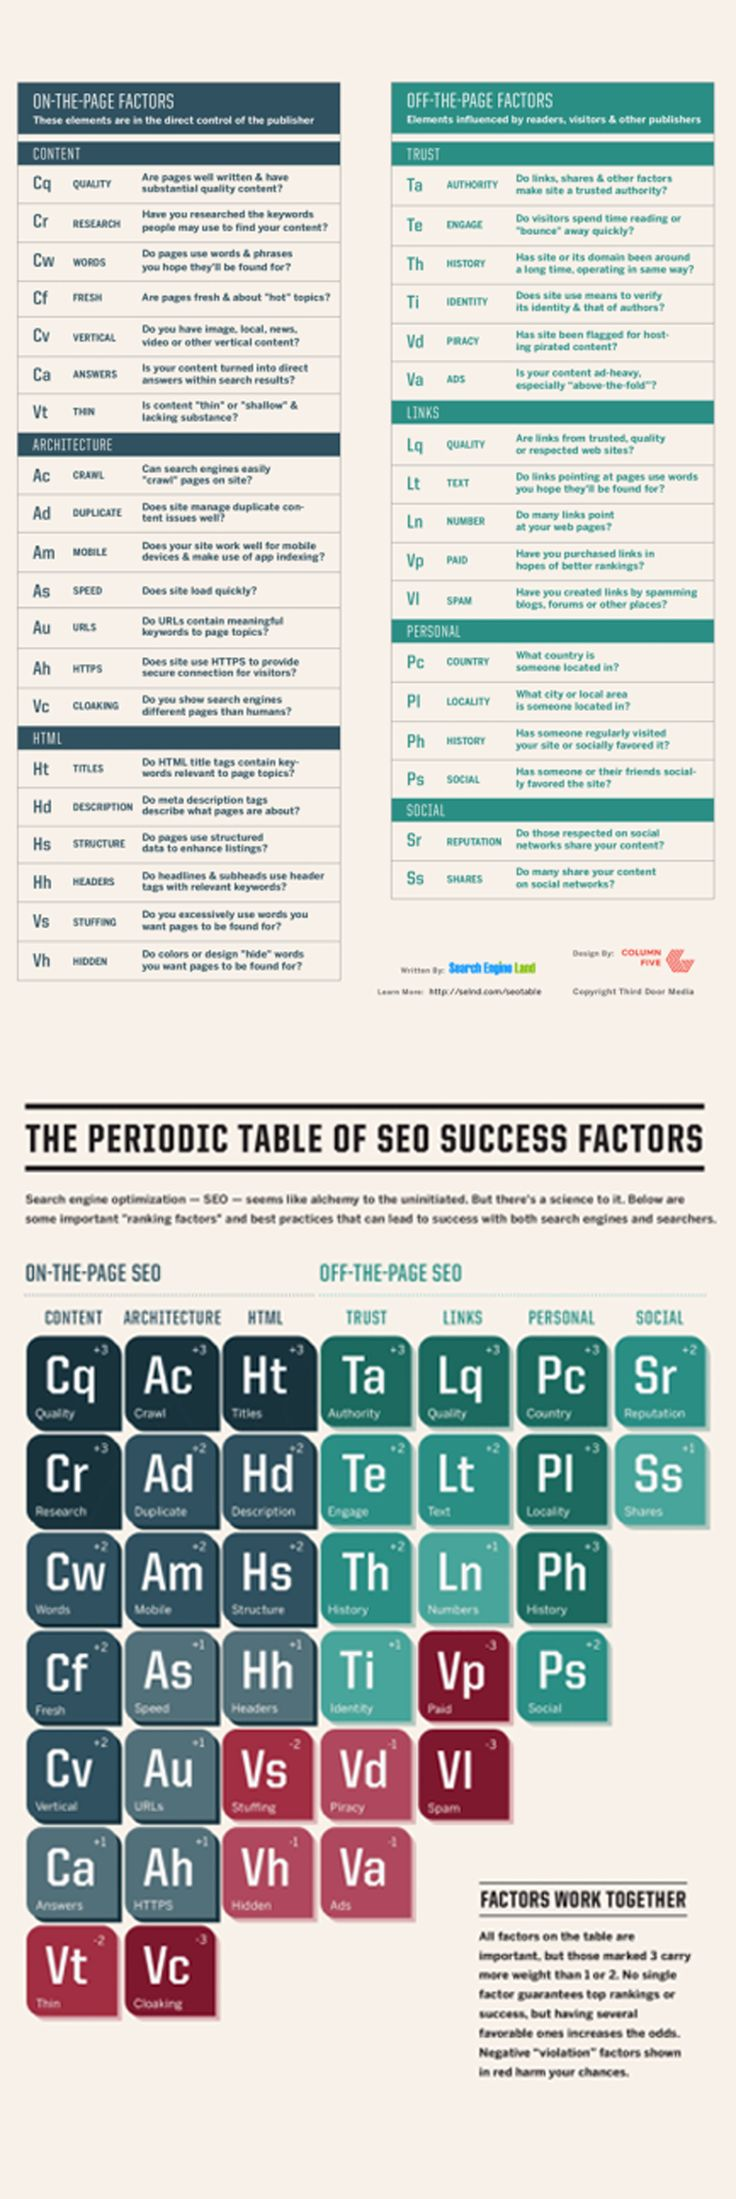 Ms de 25 ideas increbles sobre success factors en pinterest loves data loves the science to seo the periodic table of seo success factors from gamestrikefo Choice Image